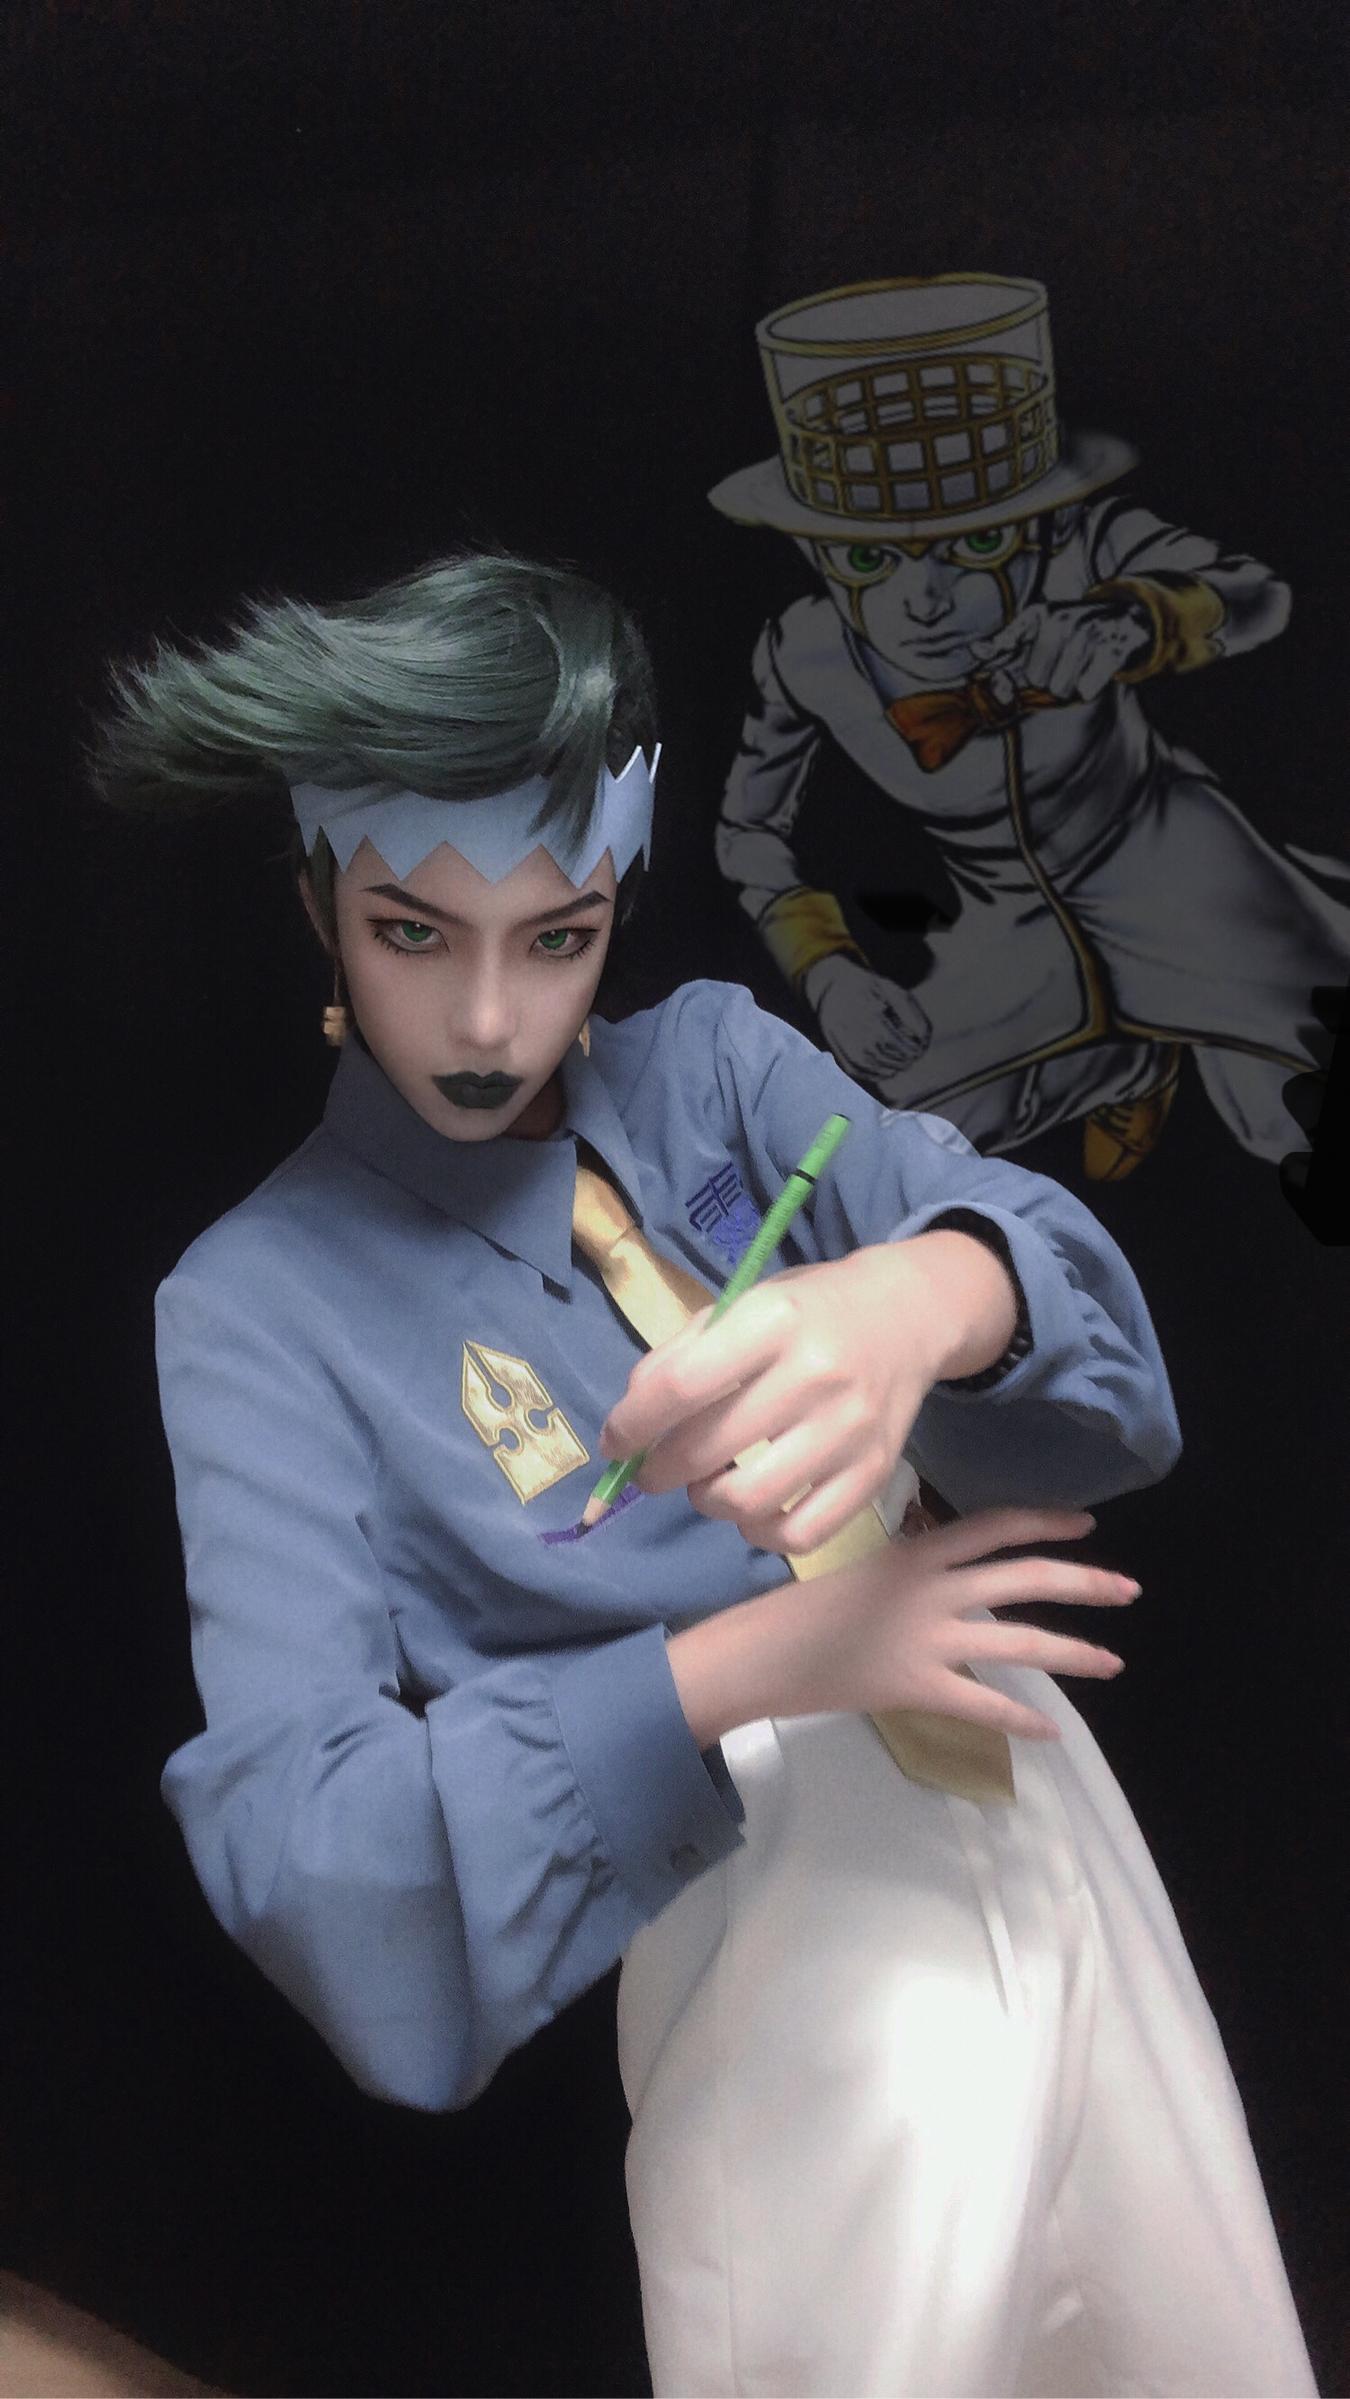 《JOJO的奇妙冒险》总结cosplay【CN:妙语连珠珠珠珠】-第7张